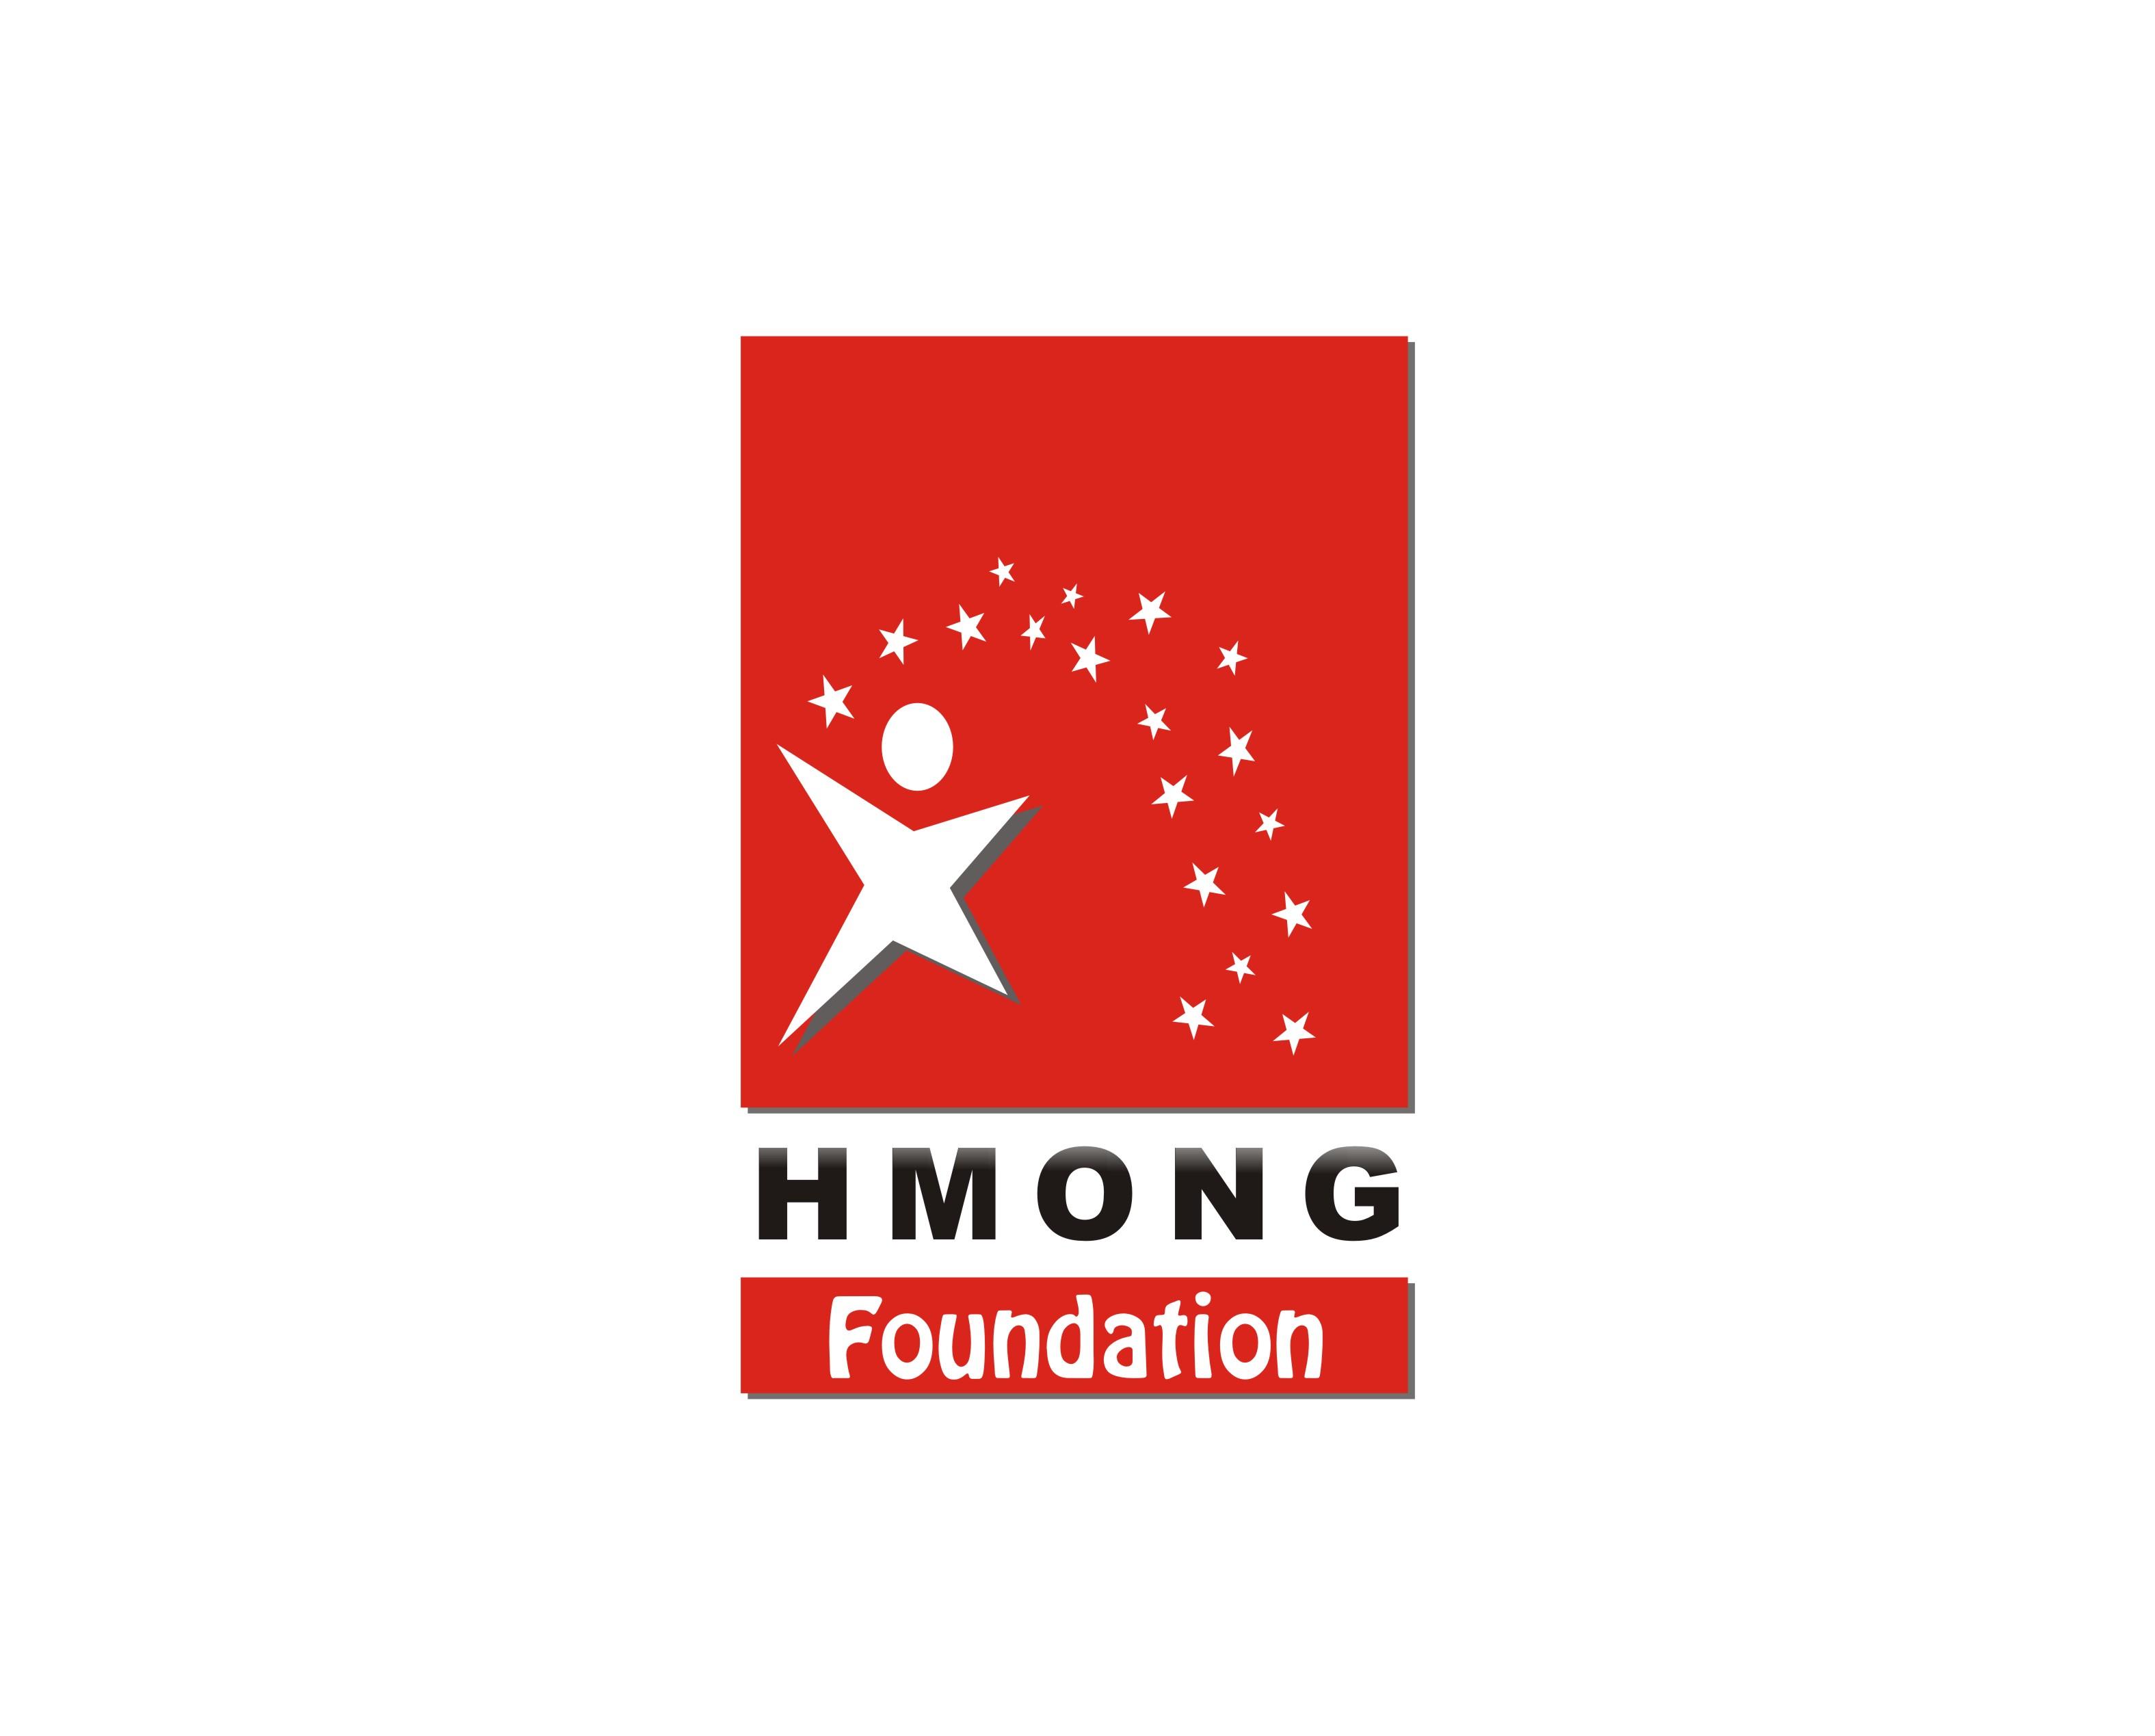 Logo Design by Shailender Kumar - Entry No. 86 in the Logo Design Contest Fun Logo Design for Hmong Foundation.